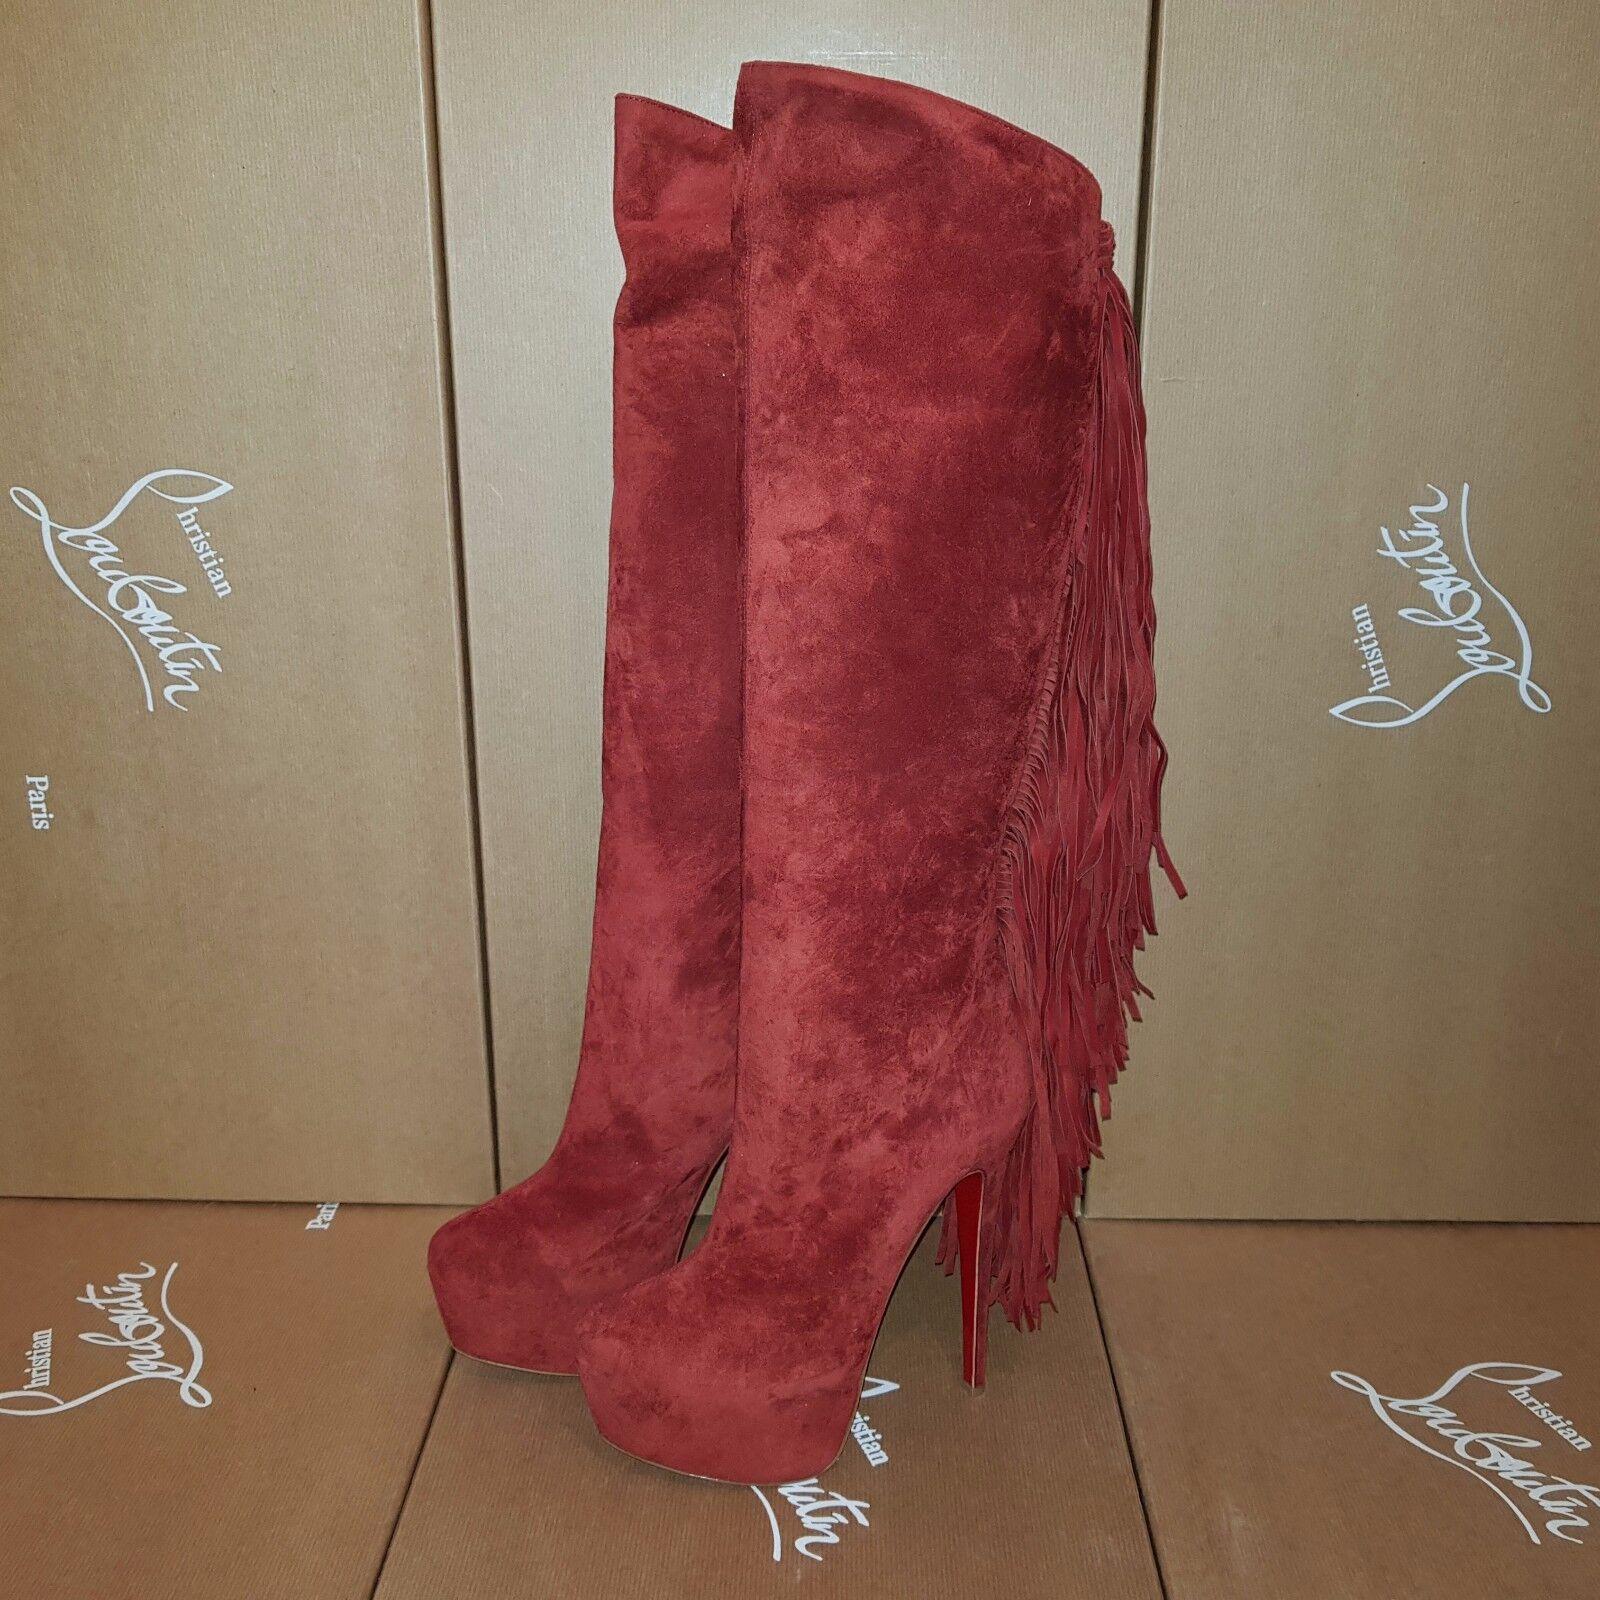 CHRISTIAN women's LOUBOUTIN Interlopa 160 Veau women's CHRISTIAN Stiefel FR 40,5 US 10,5 UK 7,5 920232